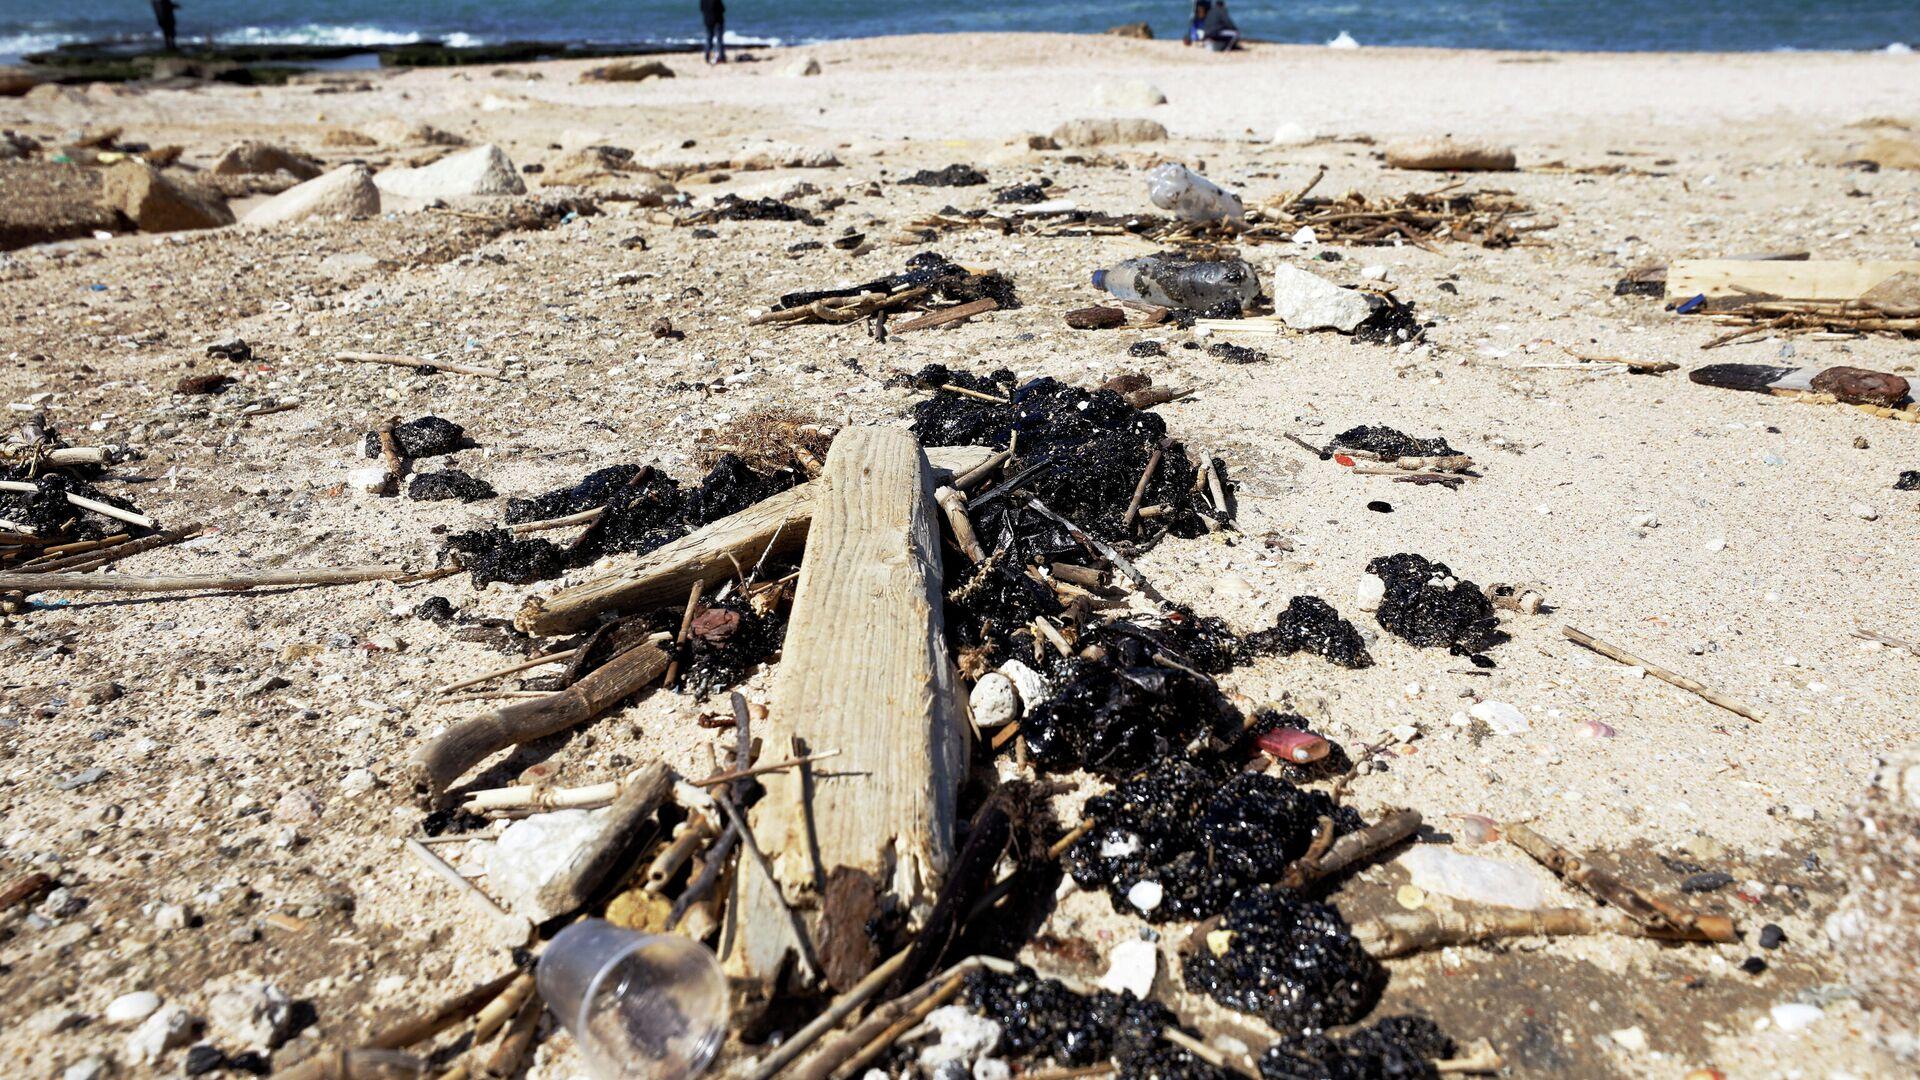 Derrame de petróleo en la costa mediterránea en Israel - Sputnik Mundo, 1920, 04.03.2021